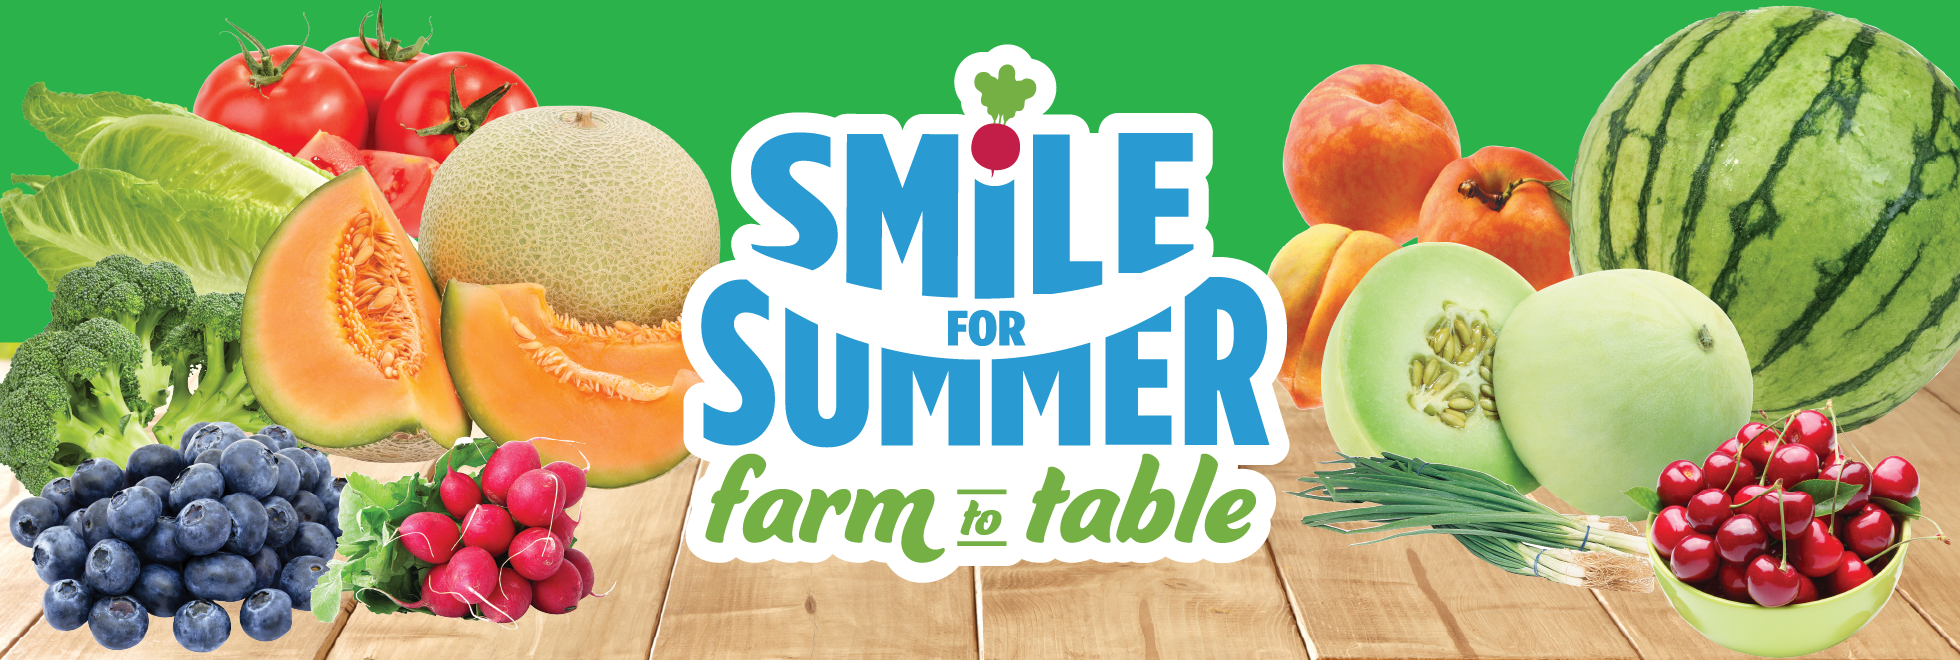 Farm to Table Fresh Produce Savings